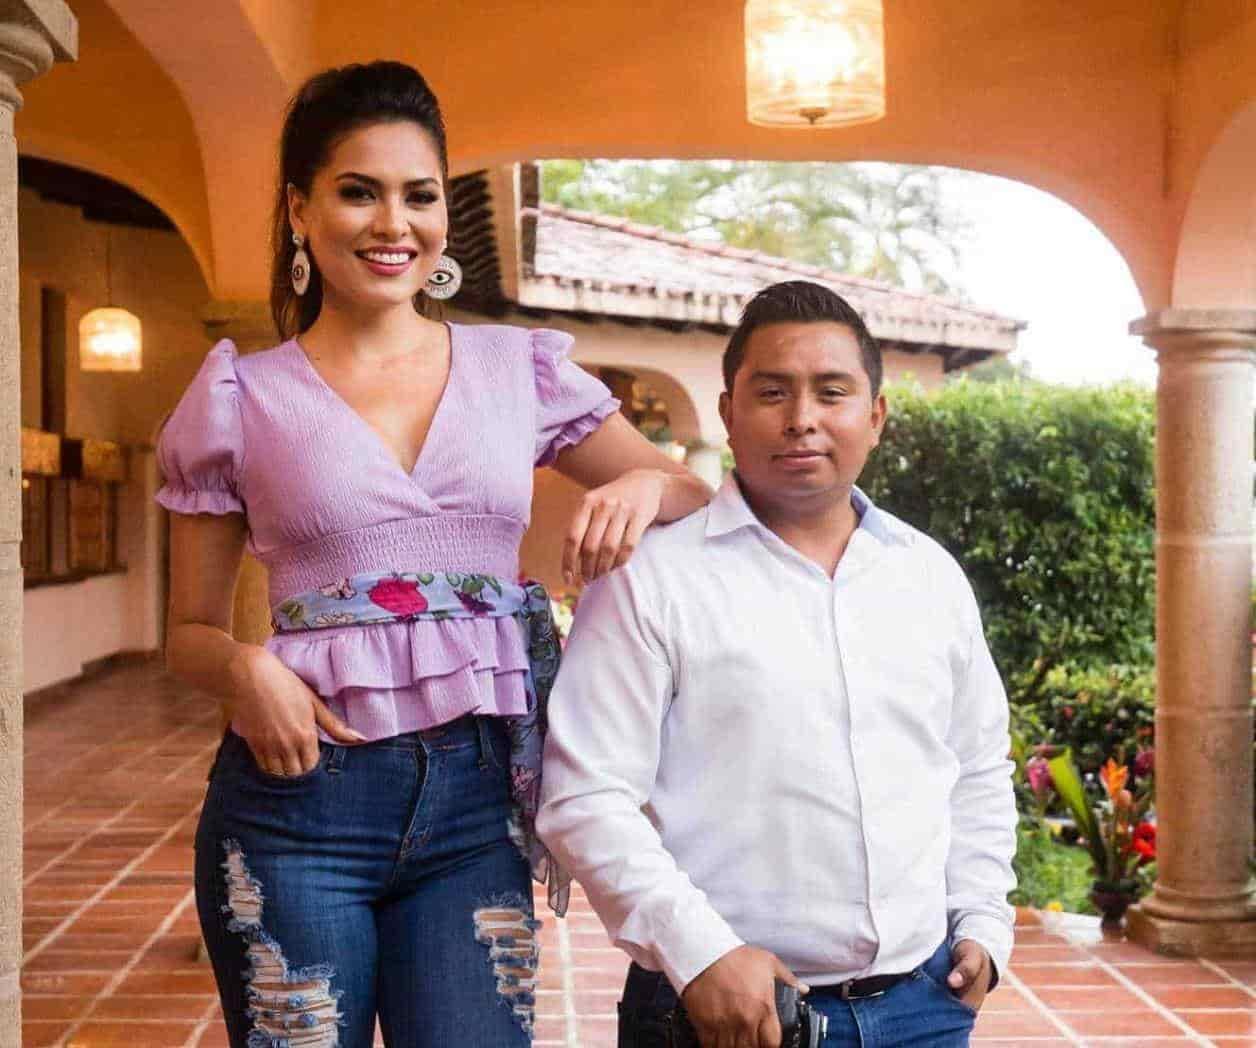 Cardenense participó en sesión fotográfica de Andrea Meza, ahora Miss Universo